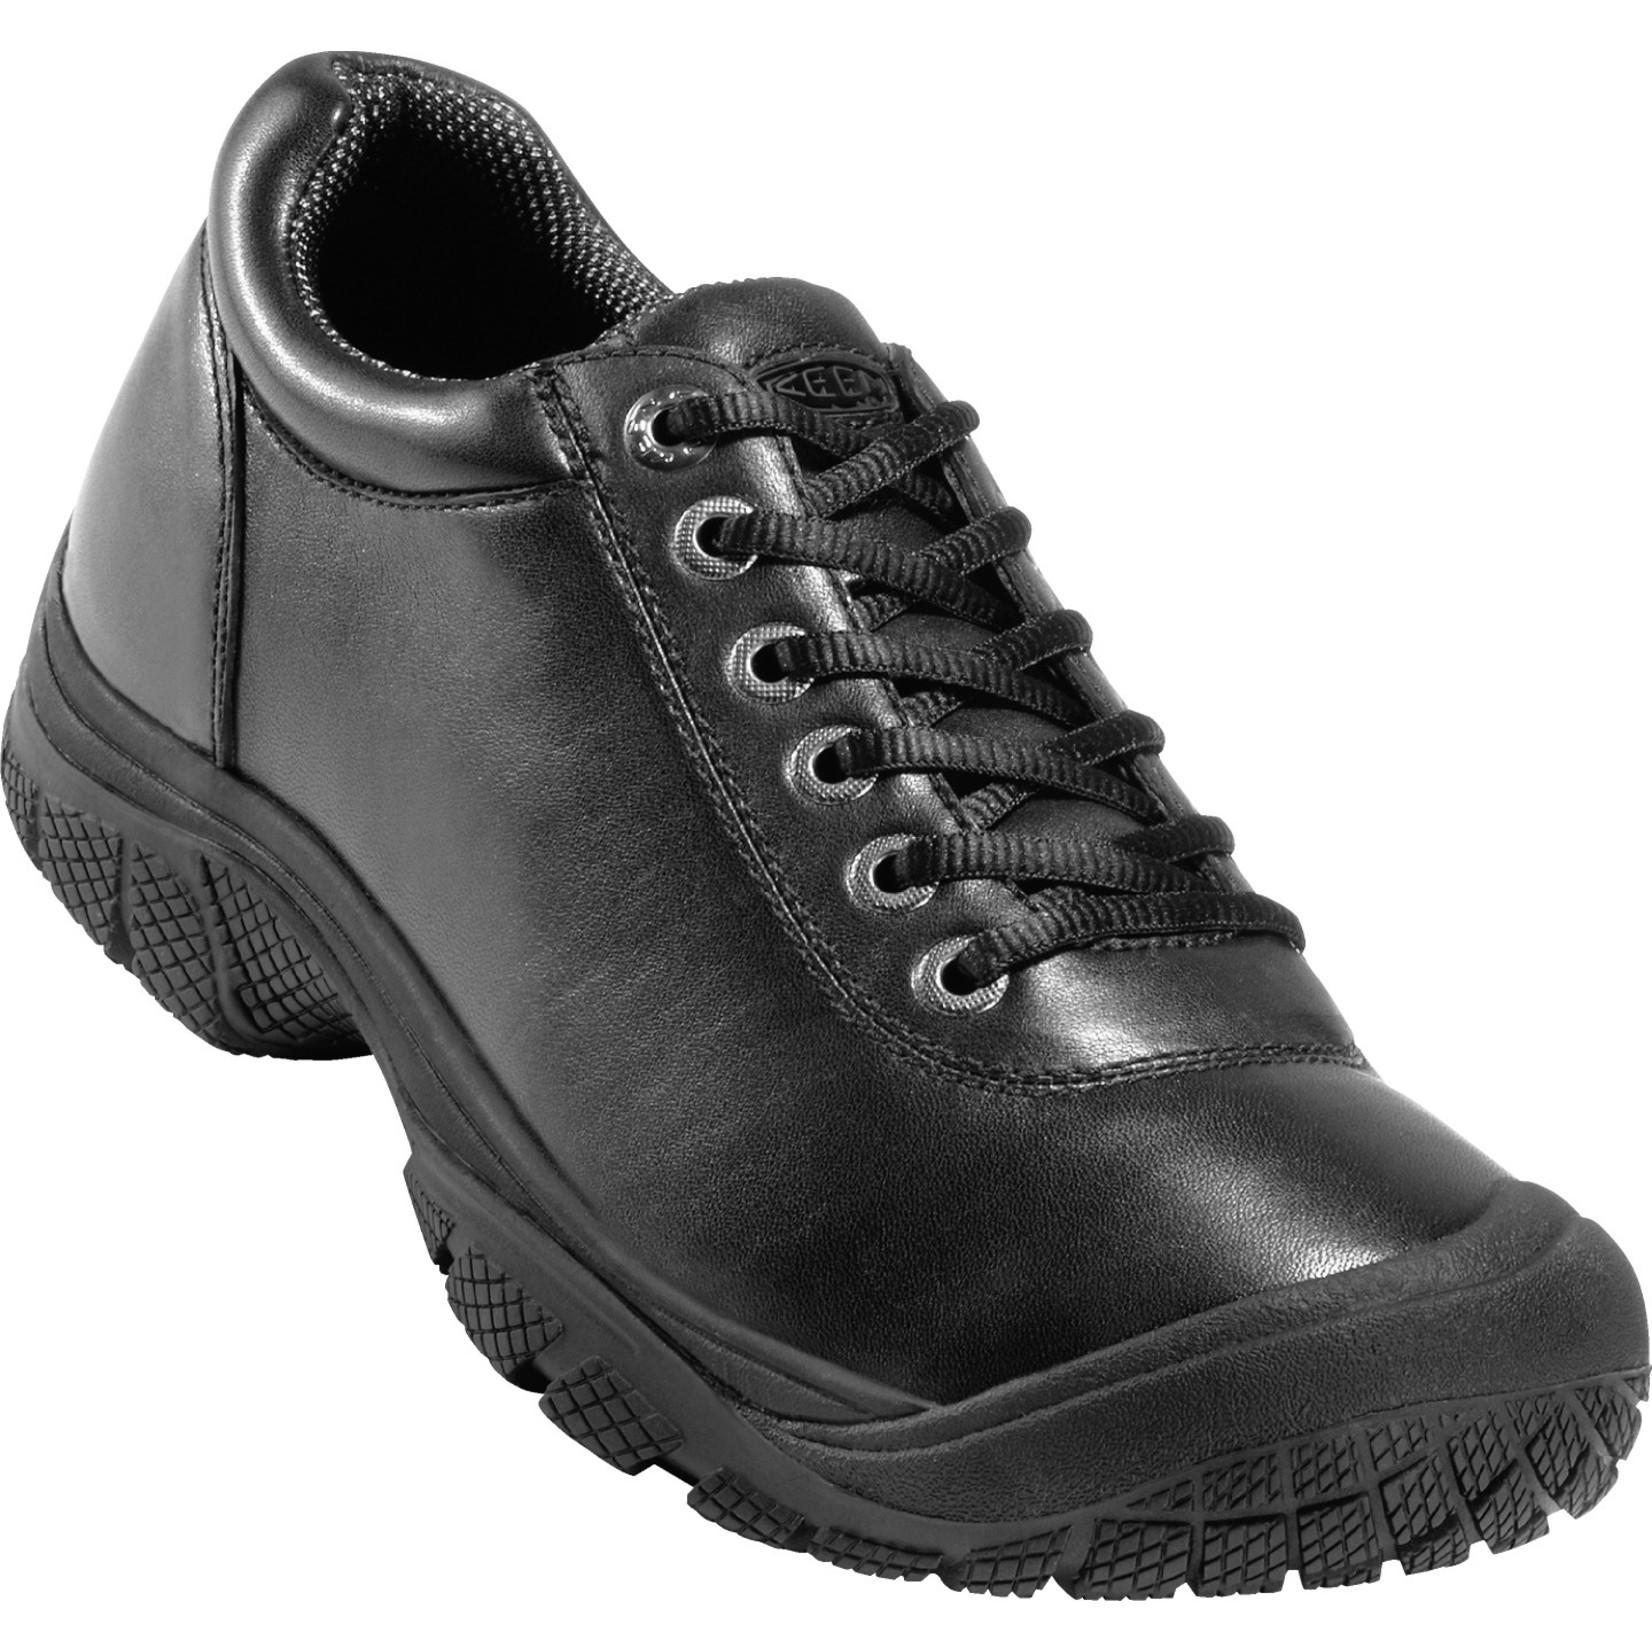 Keen Men's Keens Soft Toe PTC Work Shoe Black 1006981